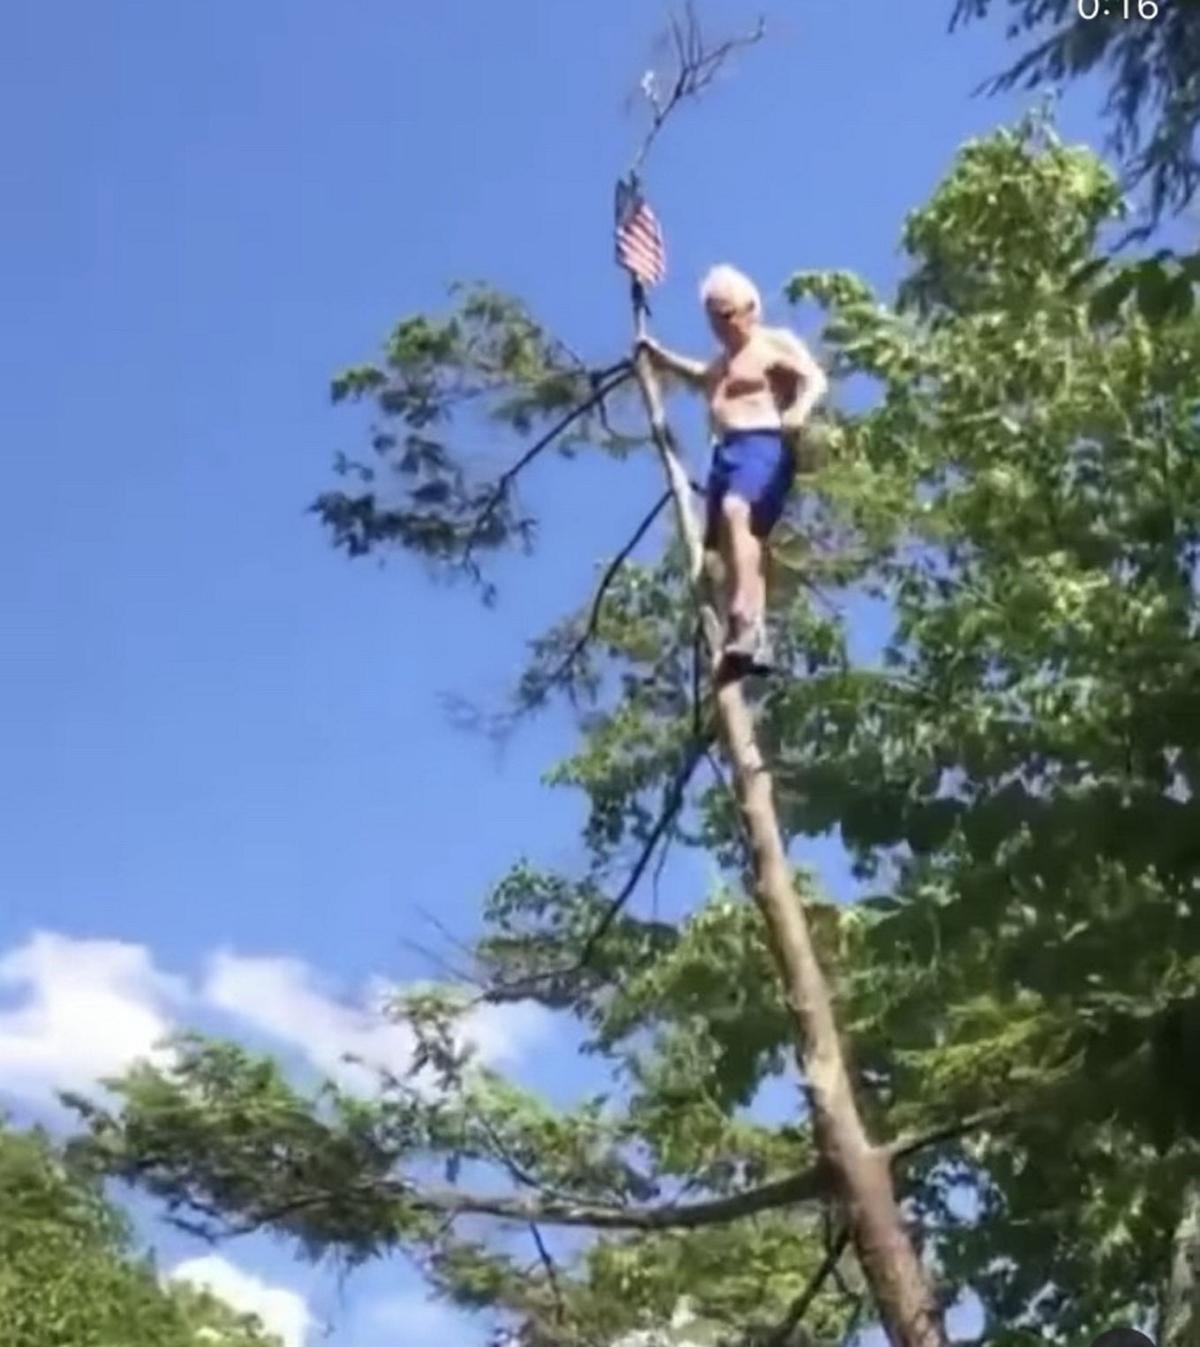 Cliff jumper makes leap of faith